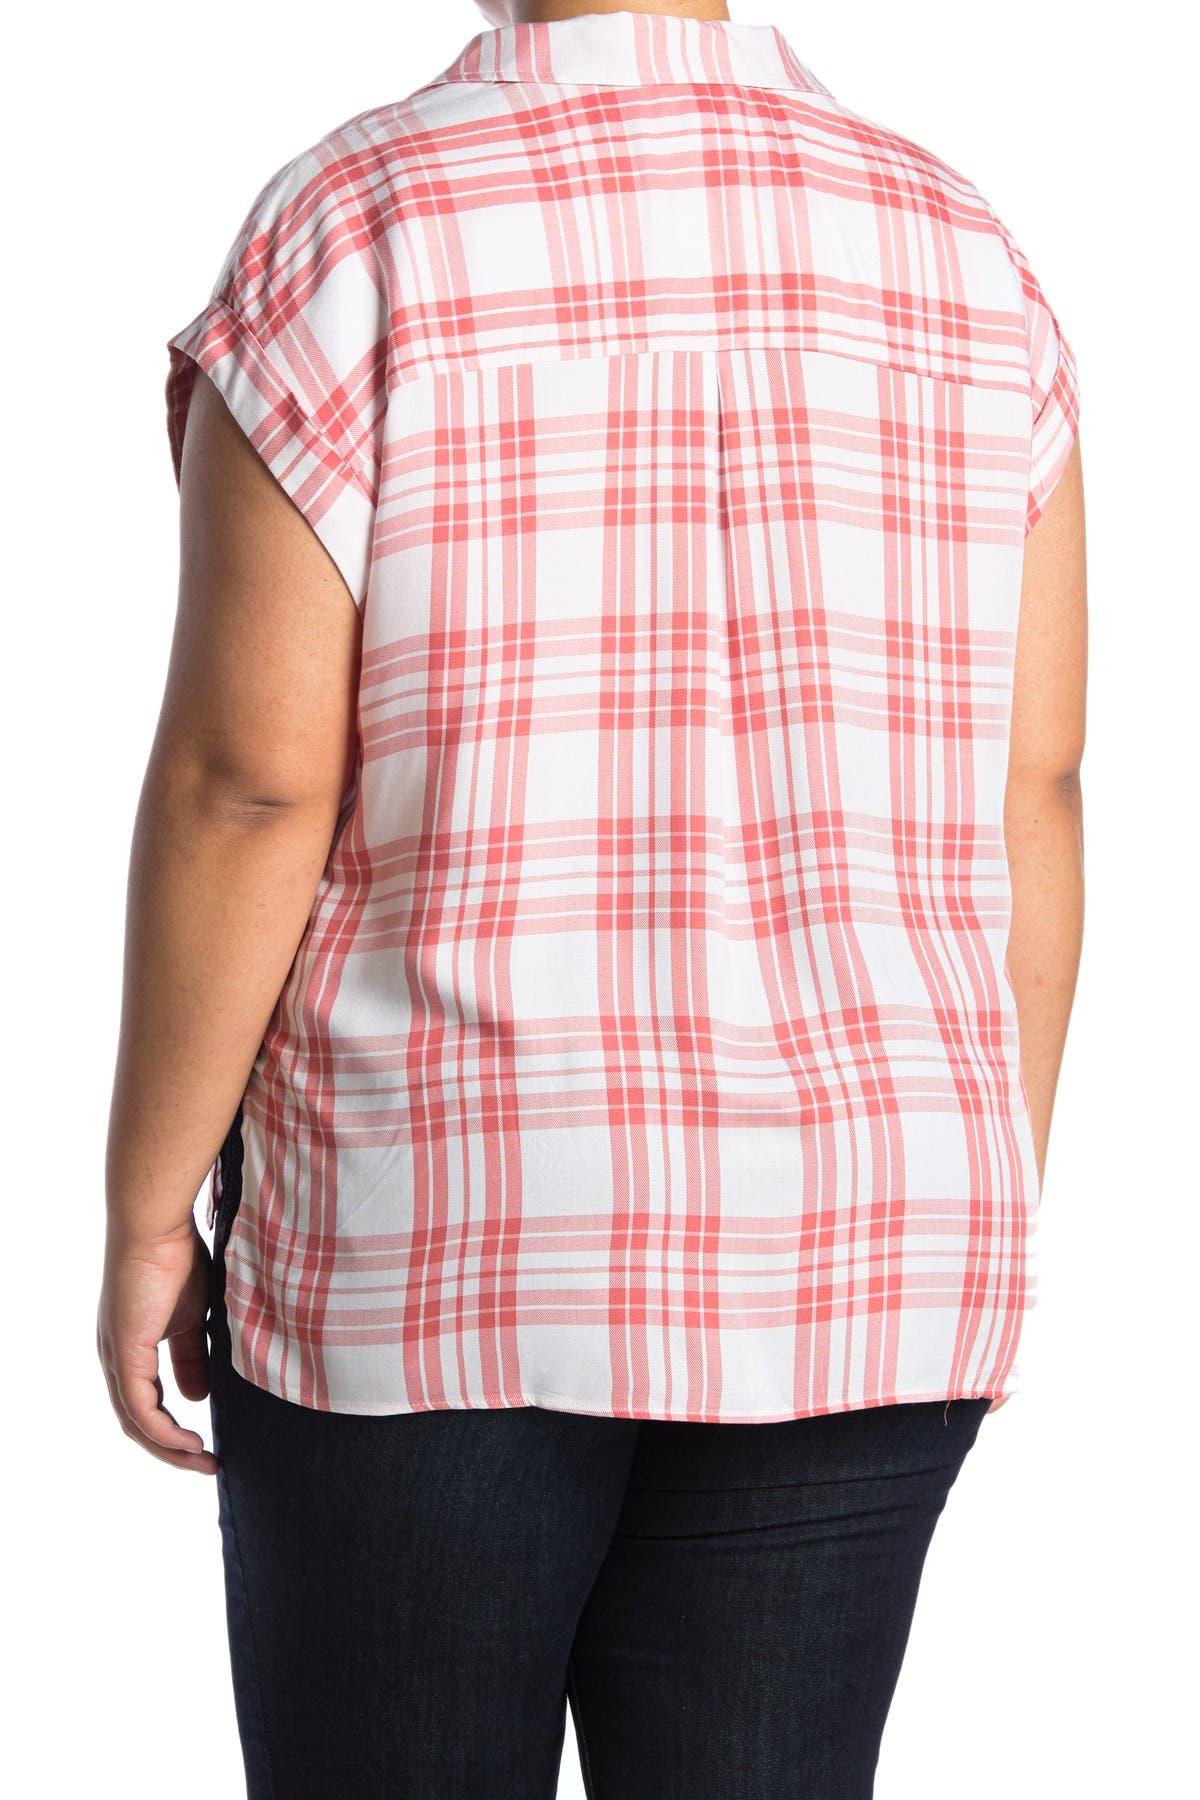 Image of Como Vintage Plaid Print Button Down Shirt